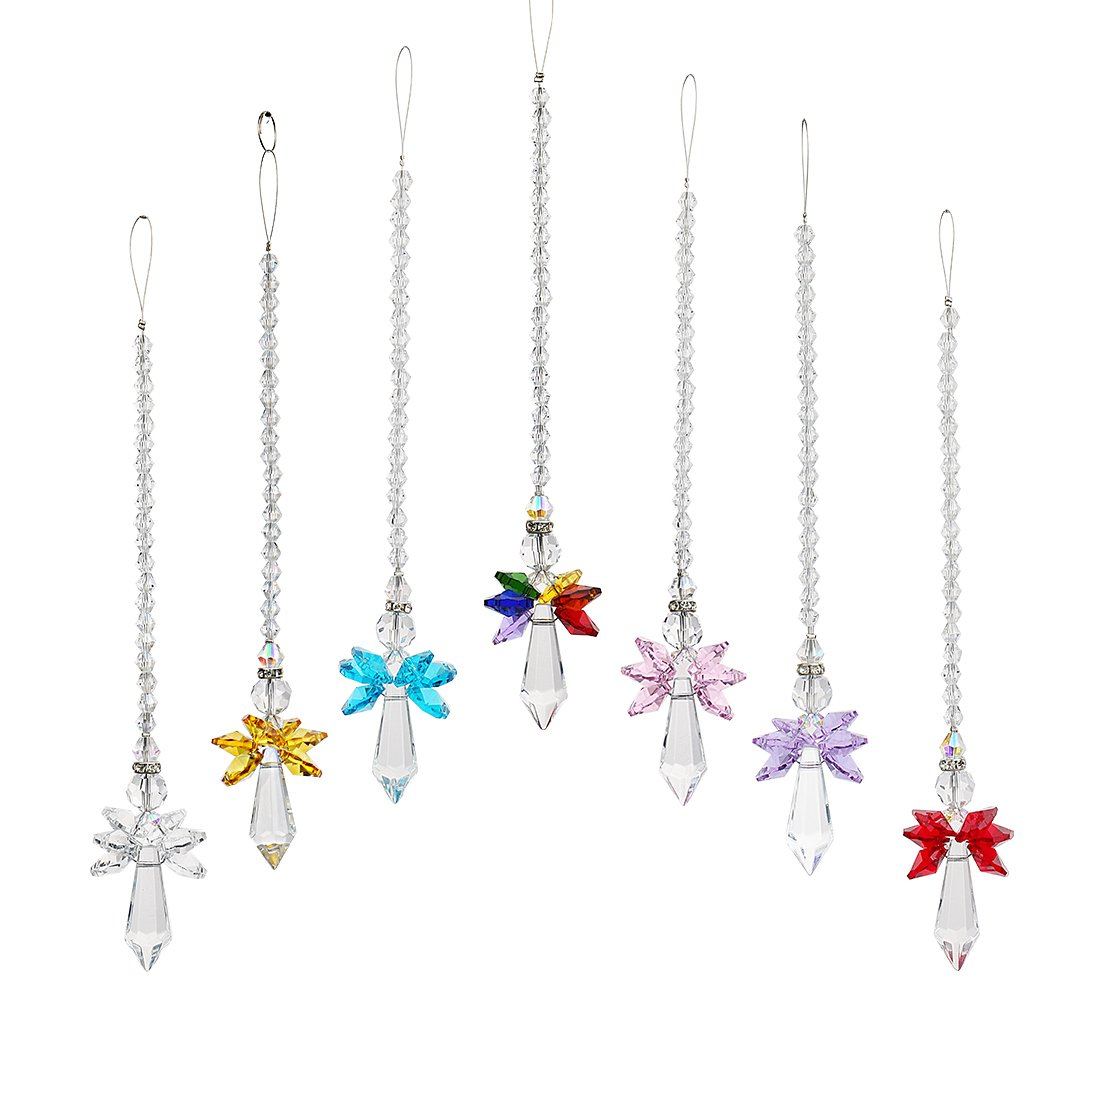 Qf Rainbow Guardian Angel Crystal Suncatcher For Home/Car Decoration & Porch Decor & Hangings Crystal Glass Ornament (Set 7)